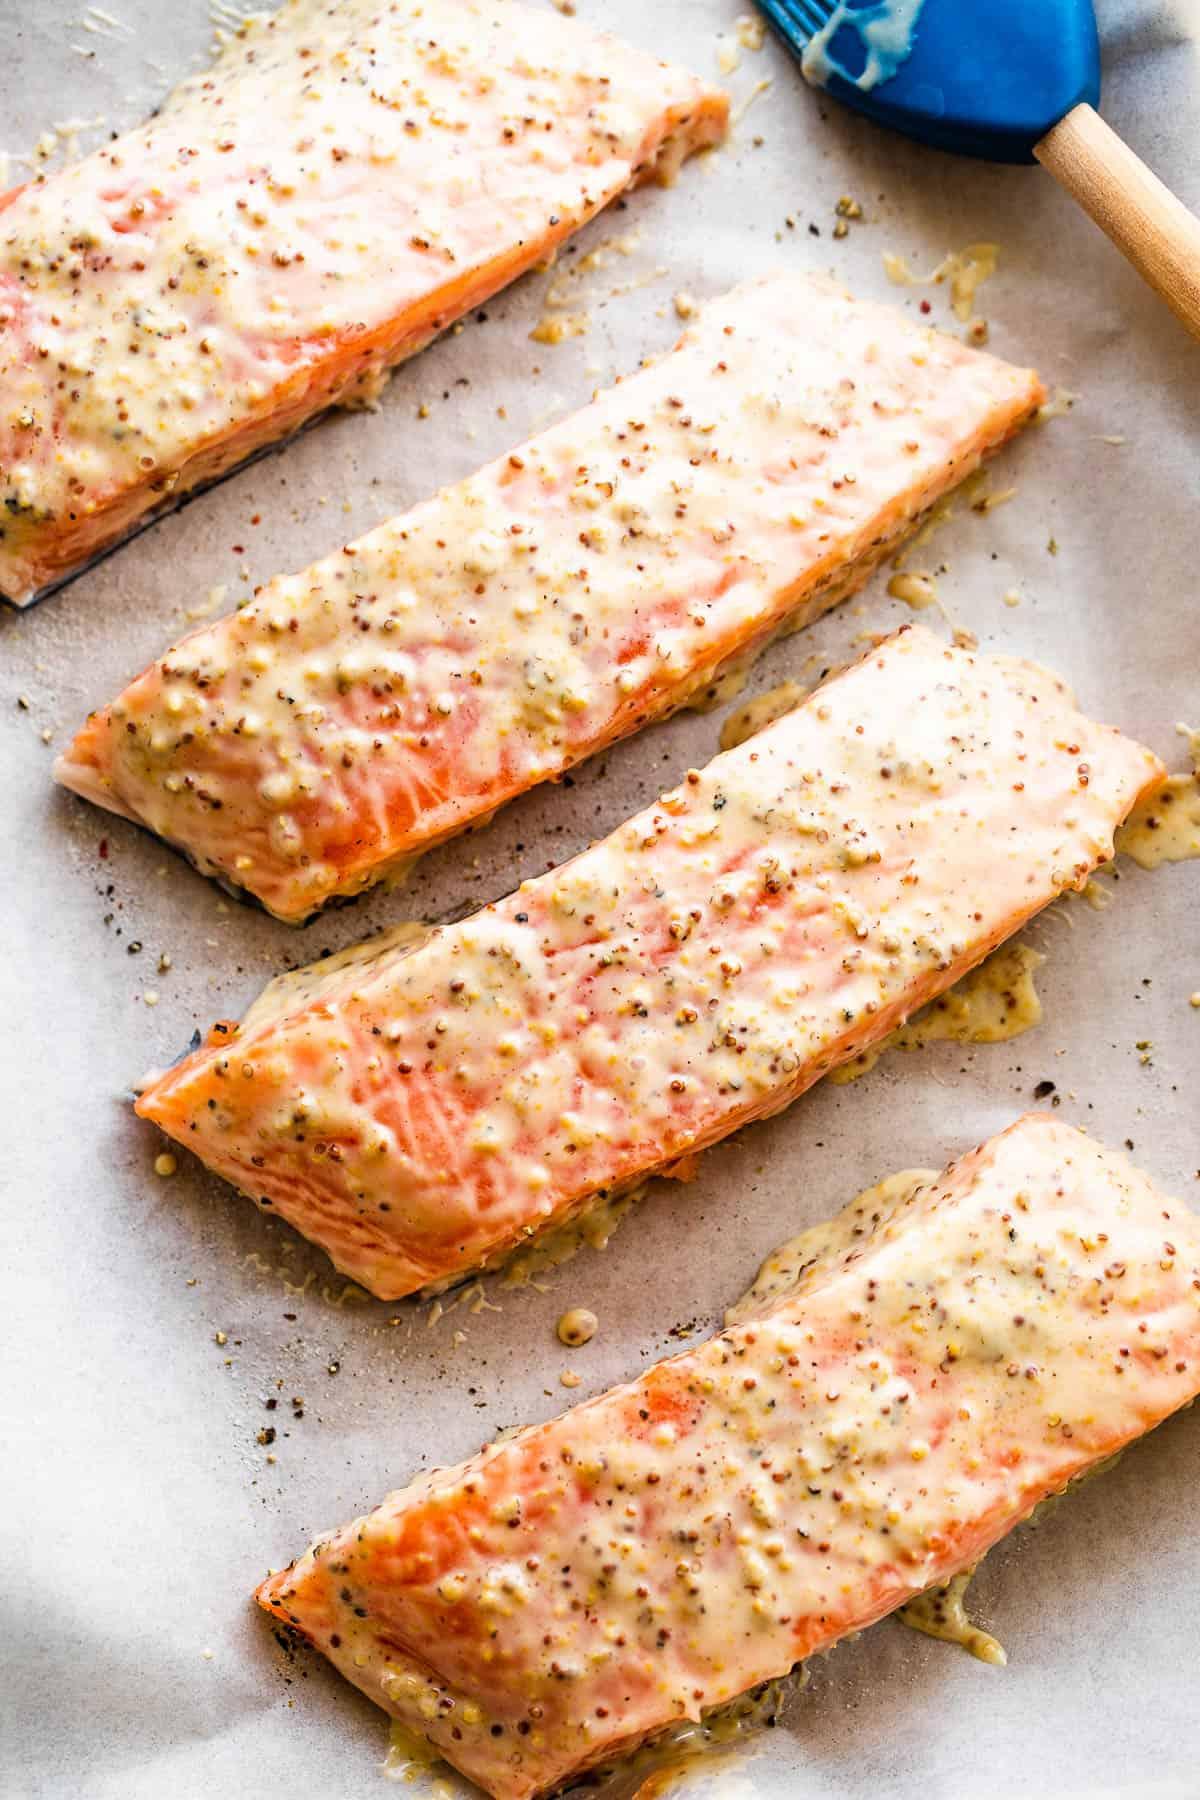 four raw salmon fillets arranged on a baking sheet